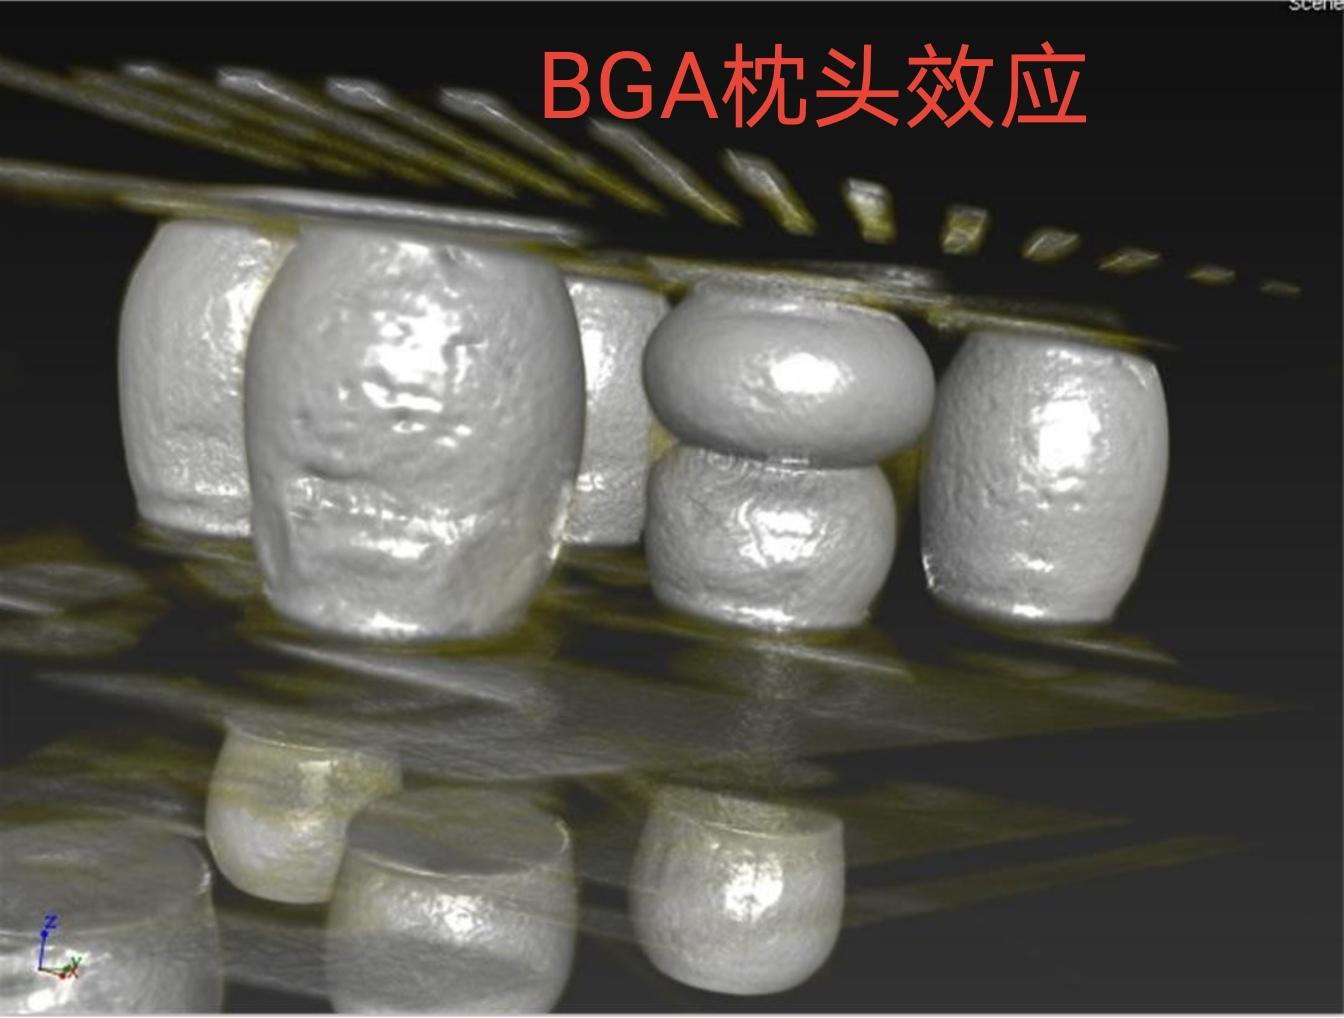 3D X-RAY检测BGA虚焊,让虚焊现出原形